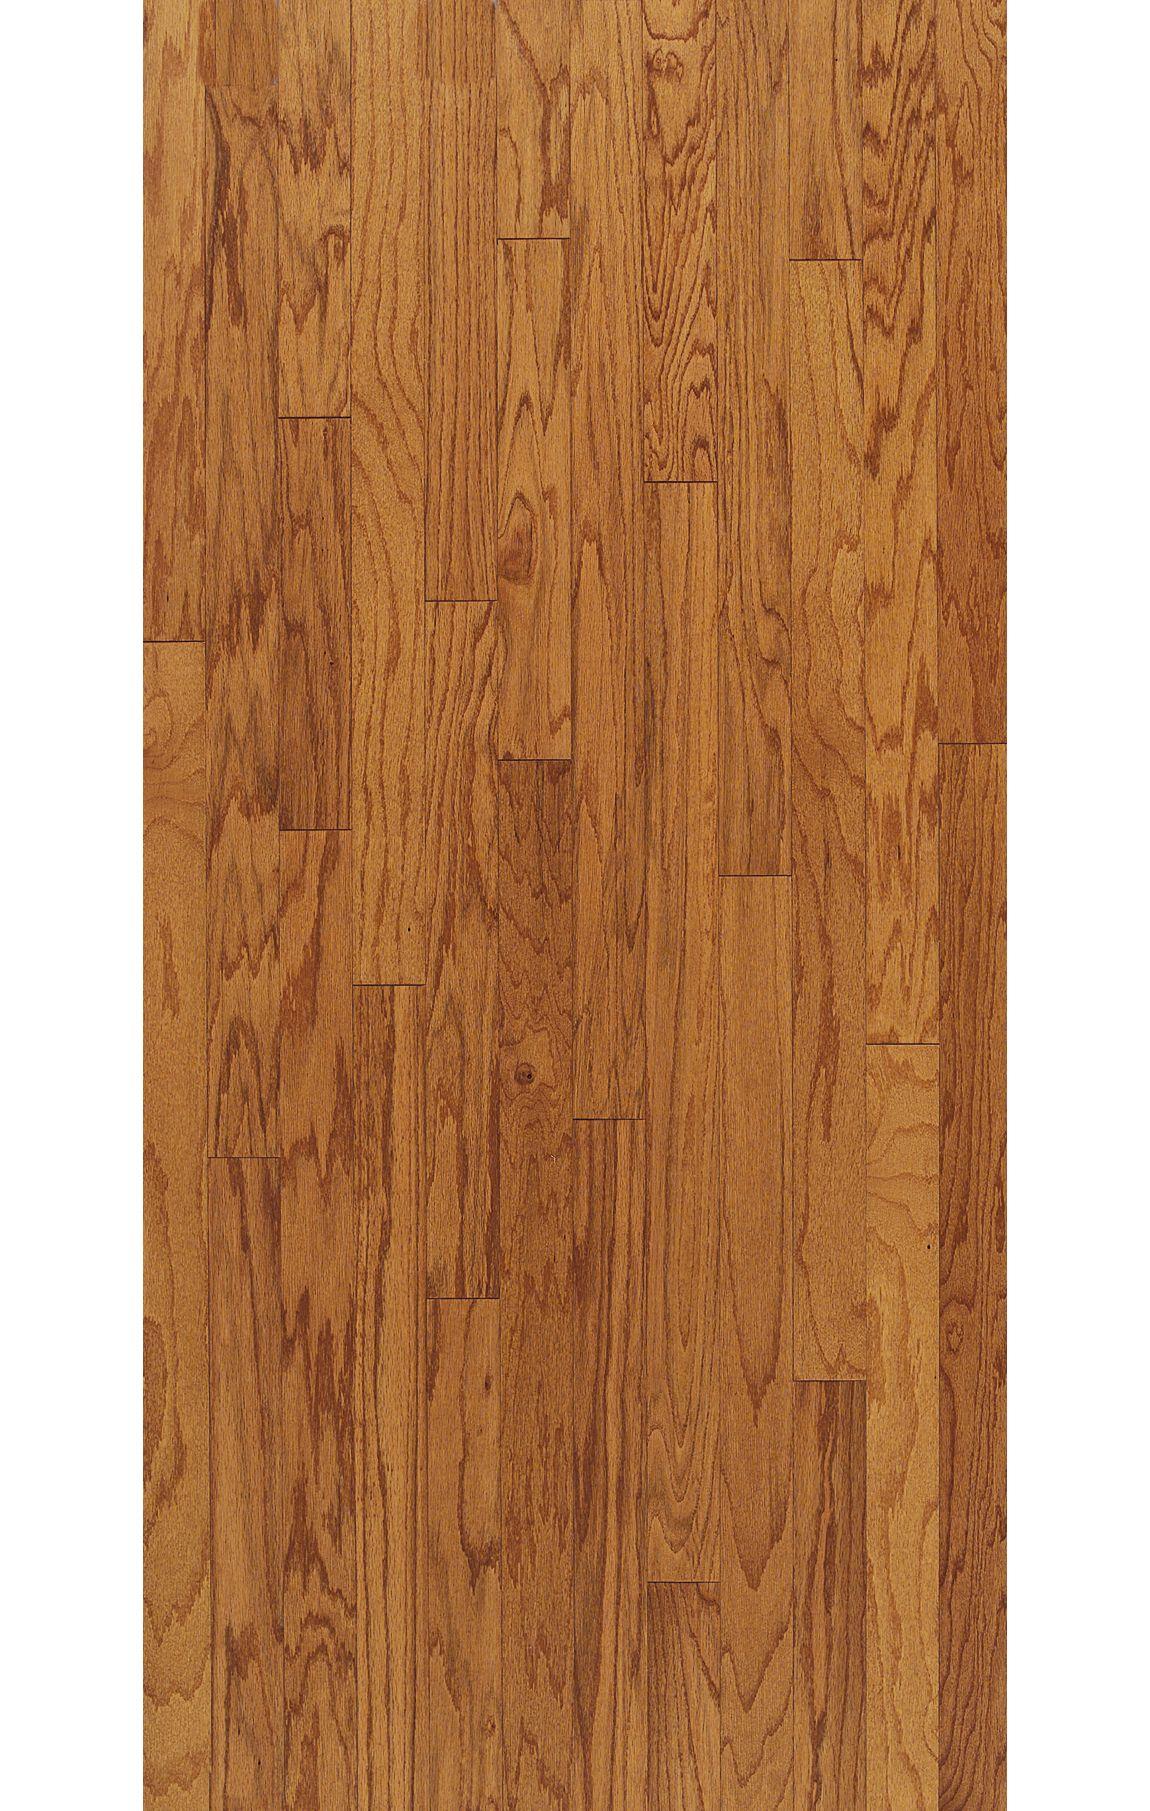 hardwood unfinished ebp springdale floor flooring bruce maple floors wood